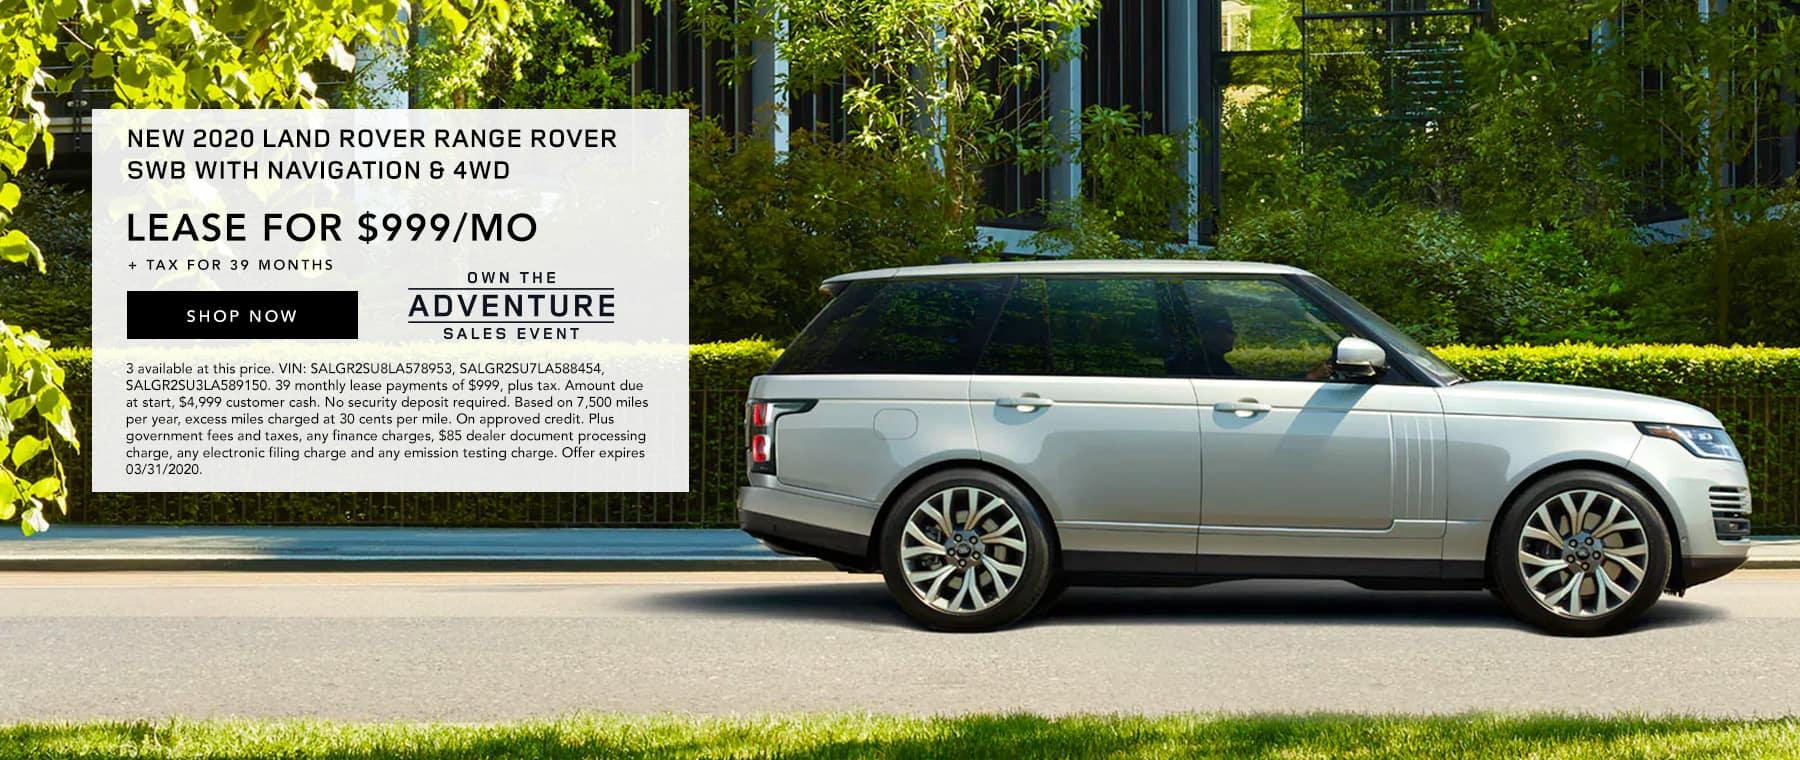 Range Rover SWB